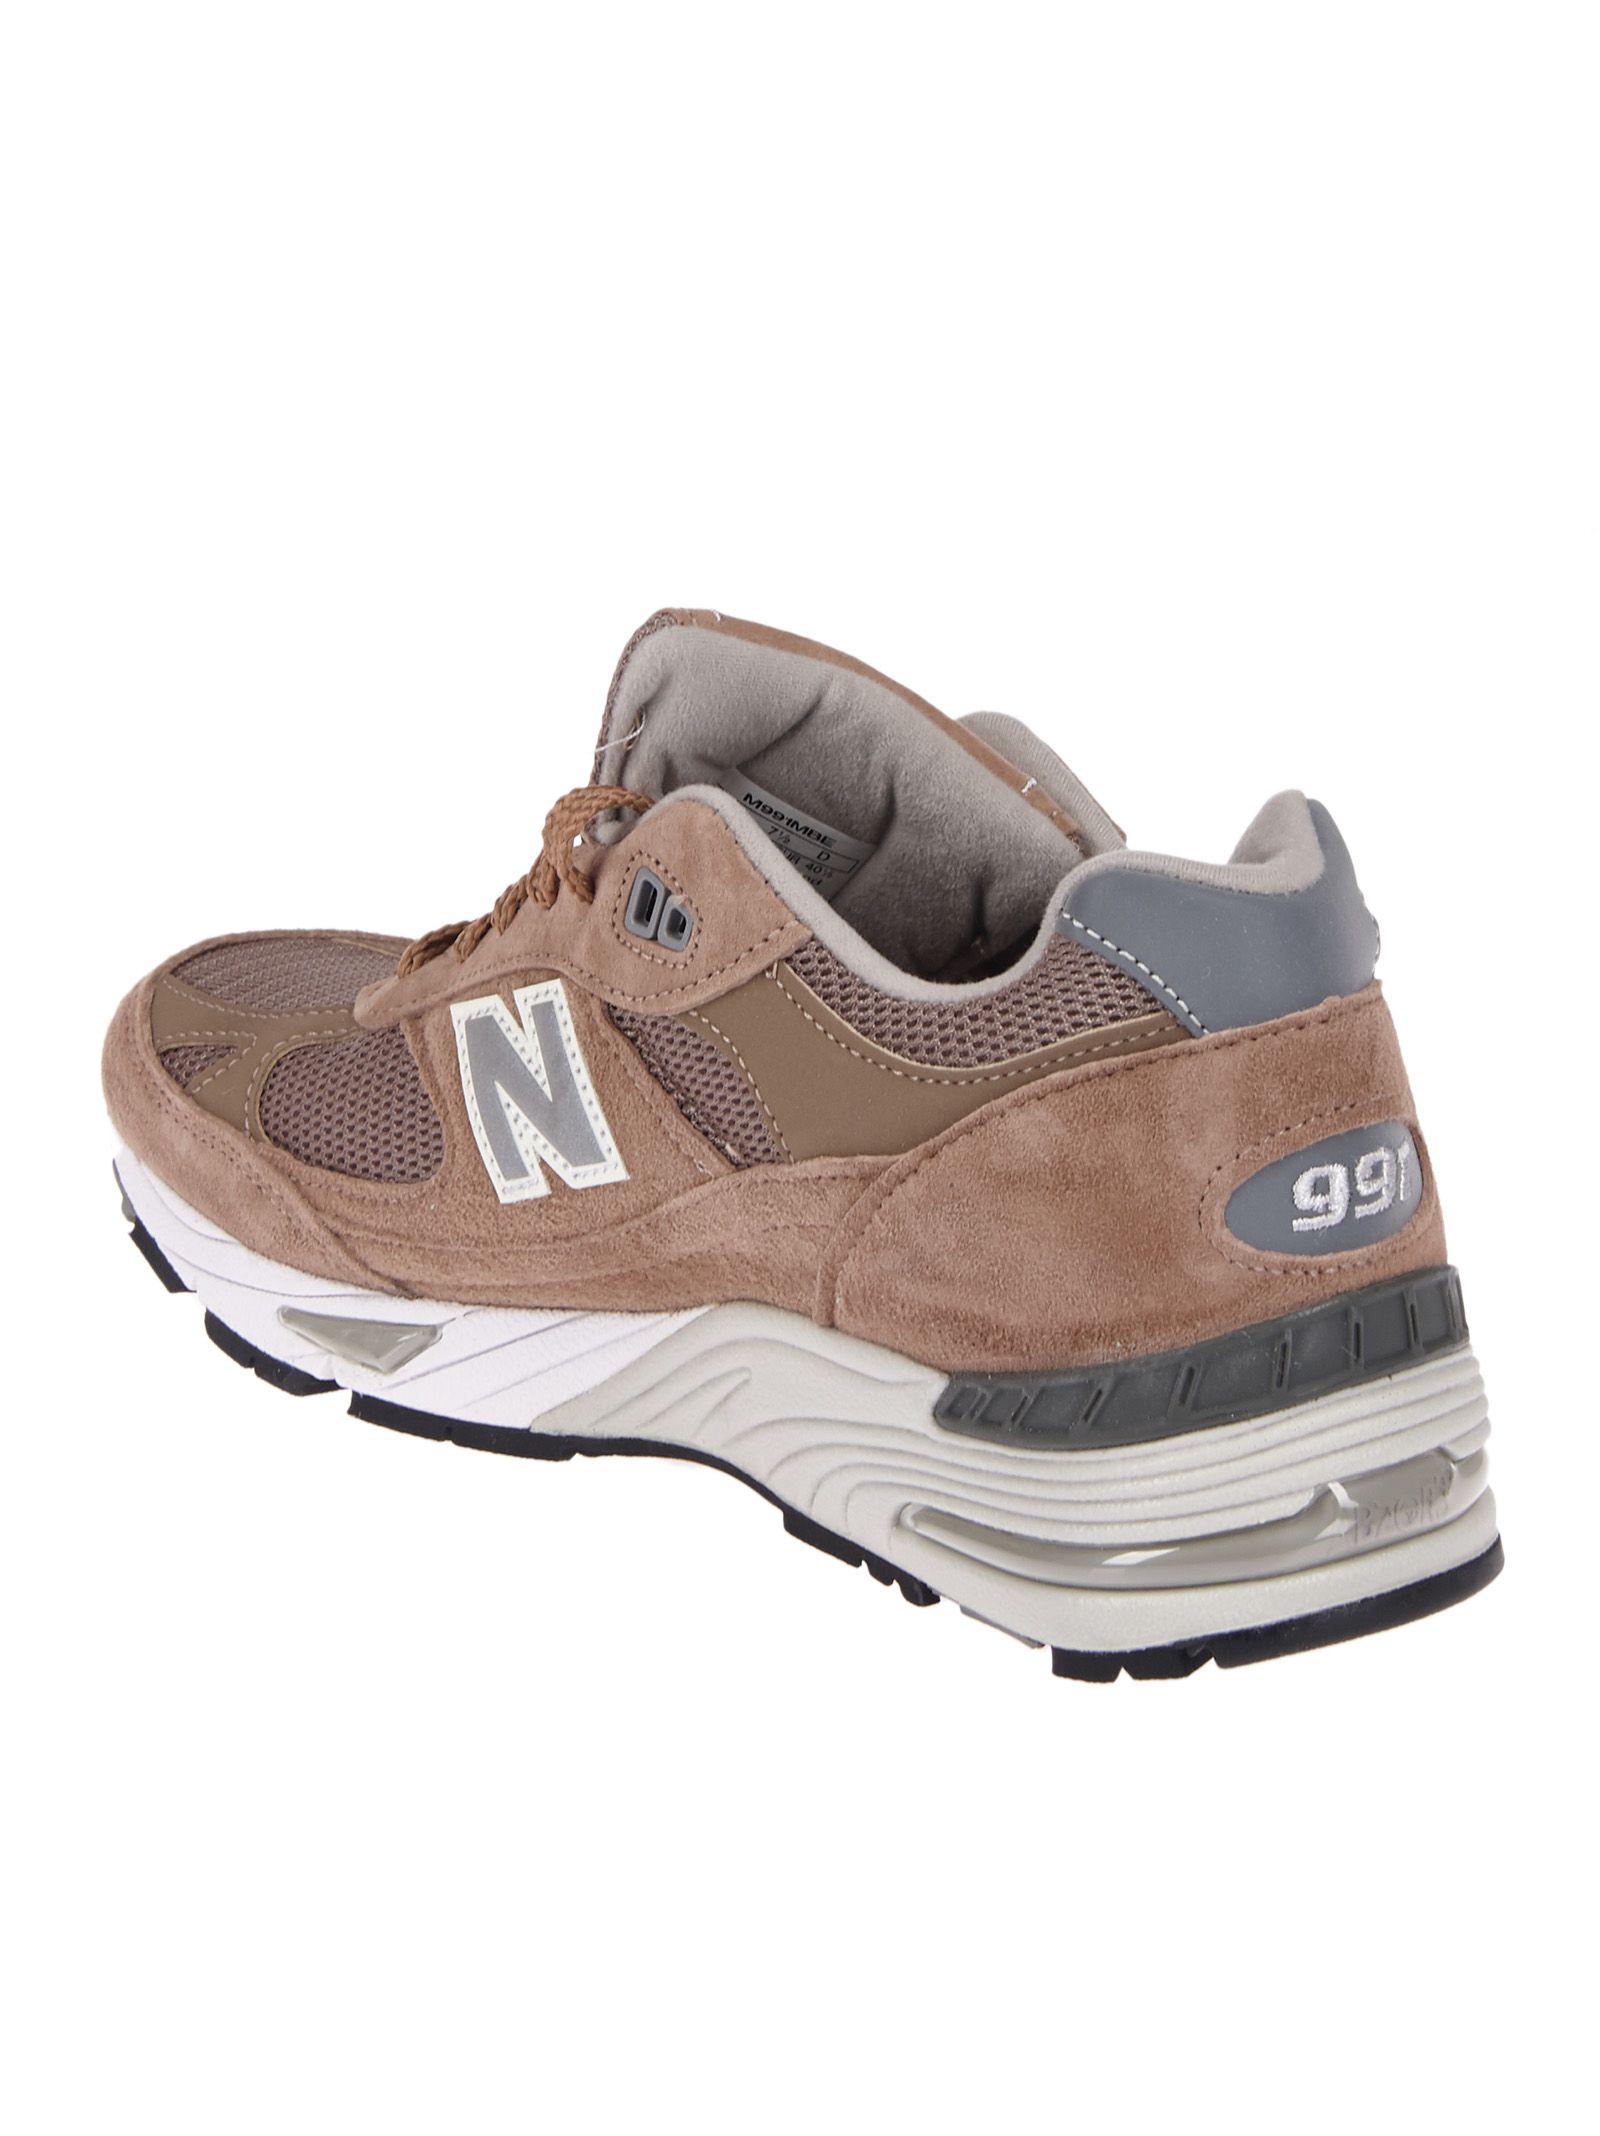 New Balance - New Balance Gartner Sports Sneakers - Beige, Men's ...